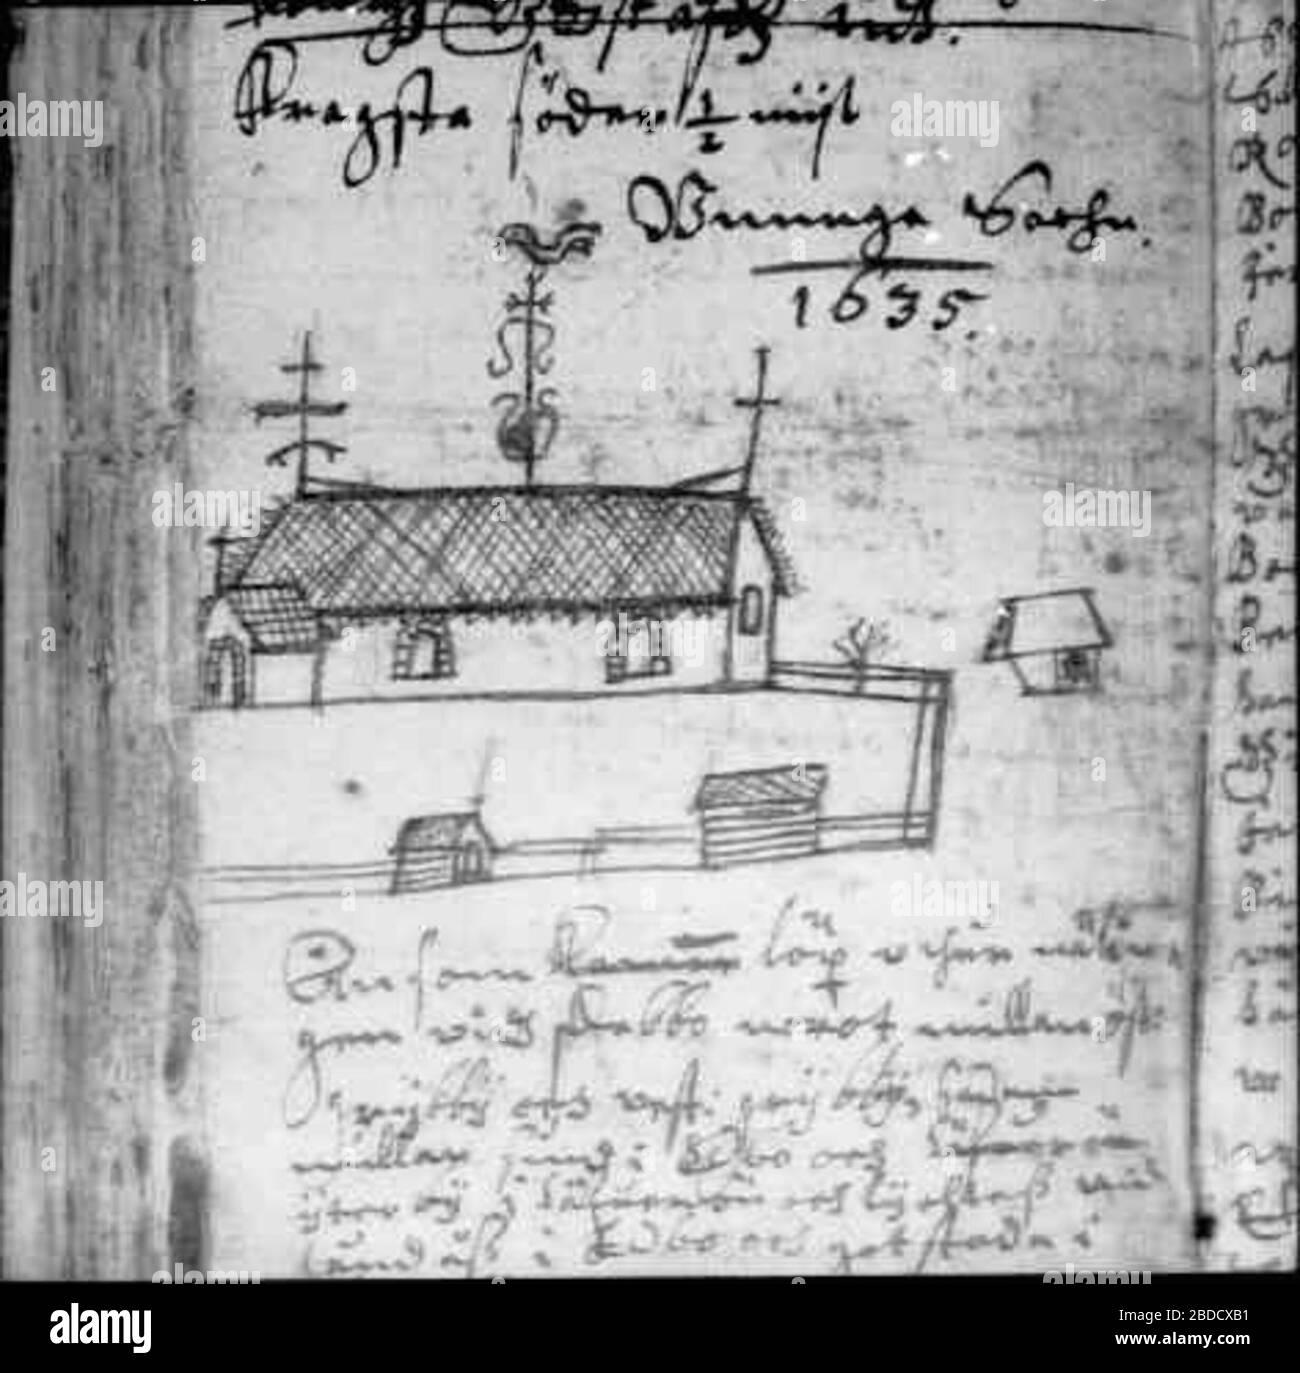 Fogd Parish, Sdermanland, Sweden Genealogy Genealogy